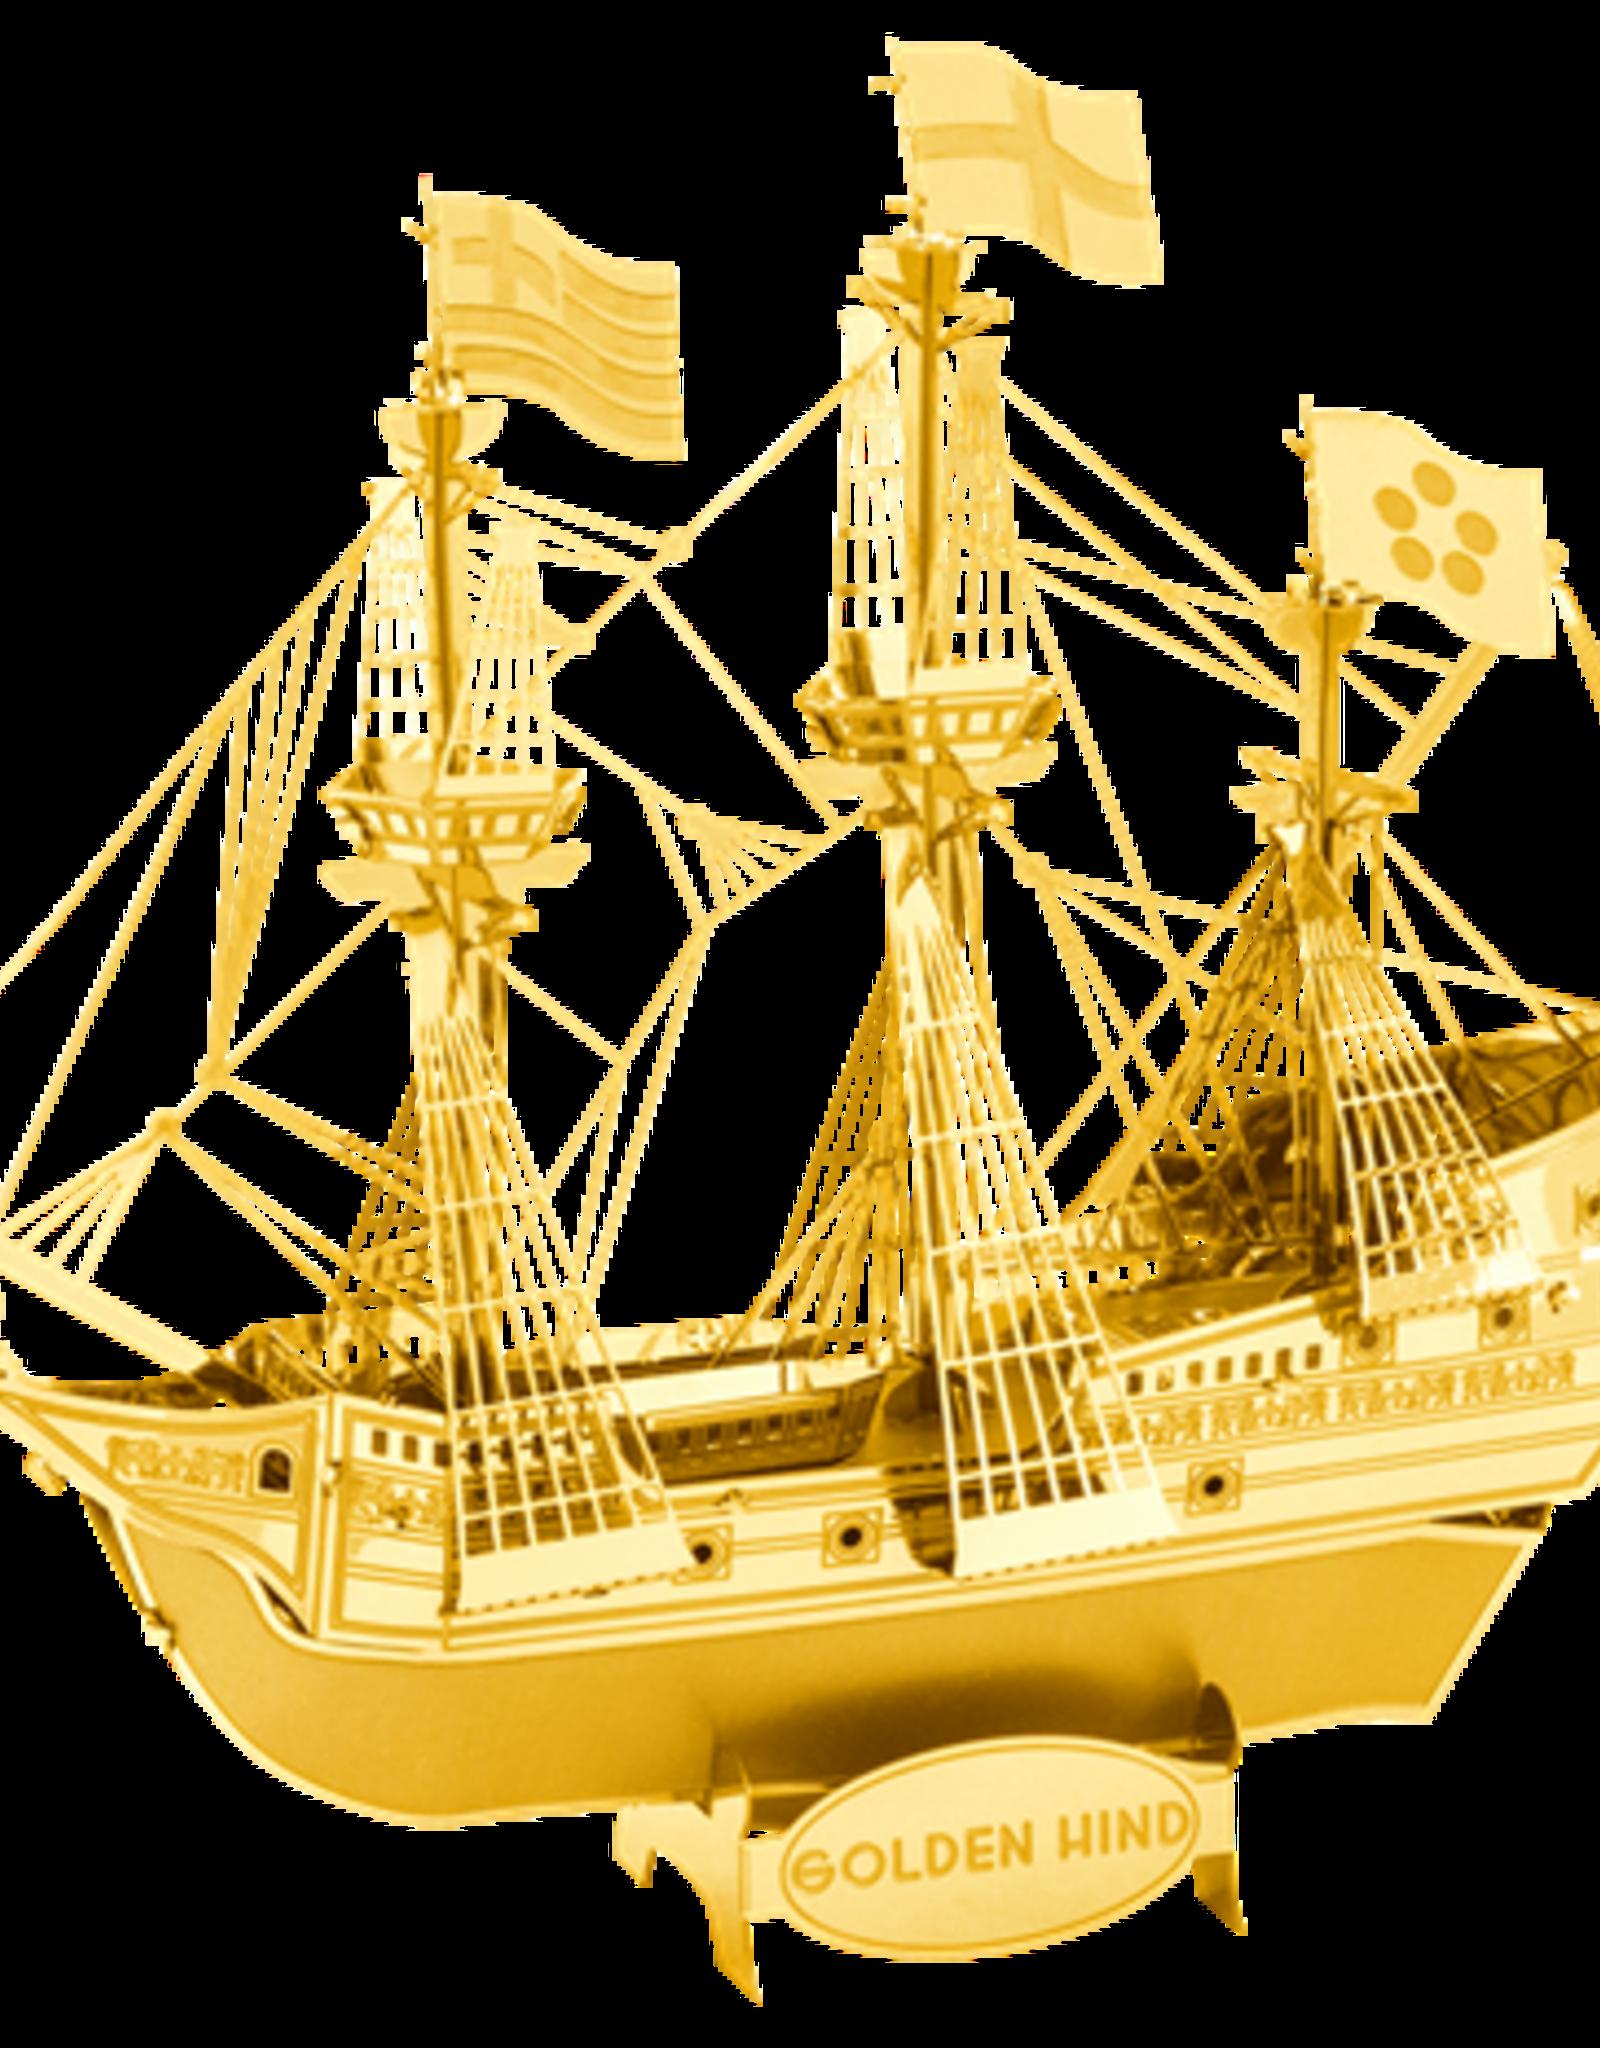 Metal Earth Golden Hind ship